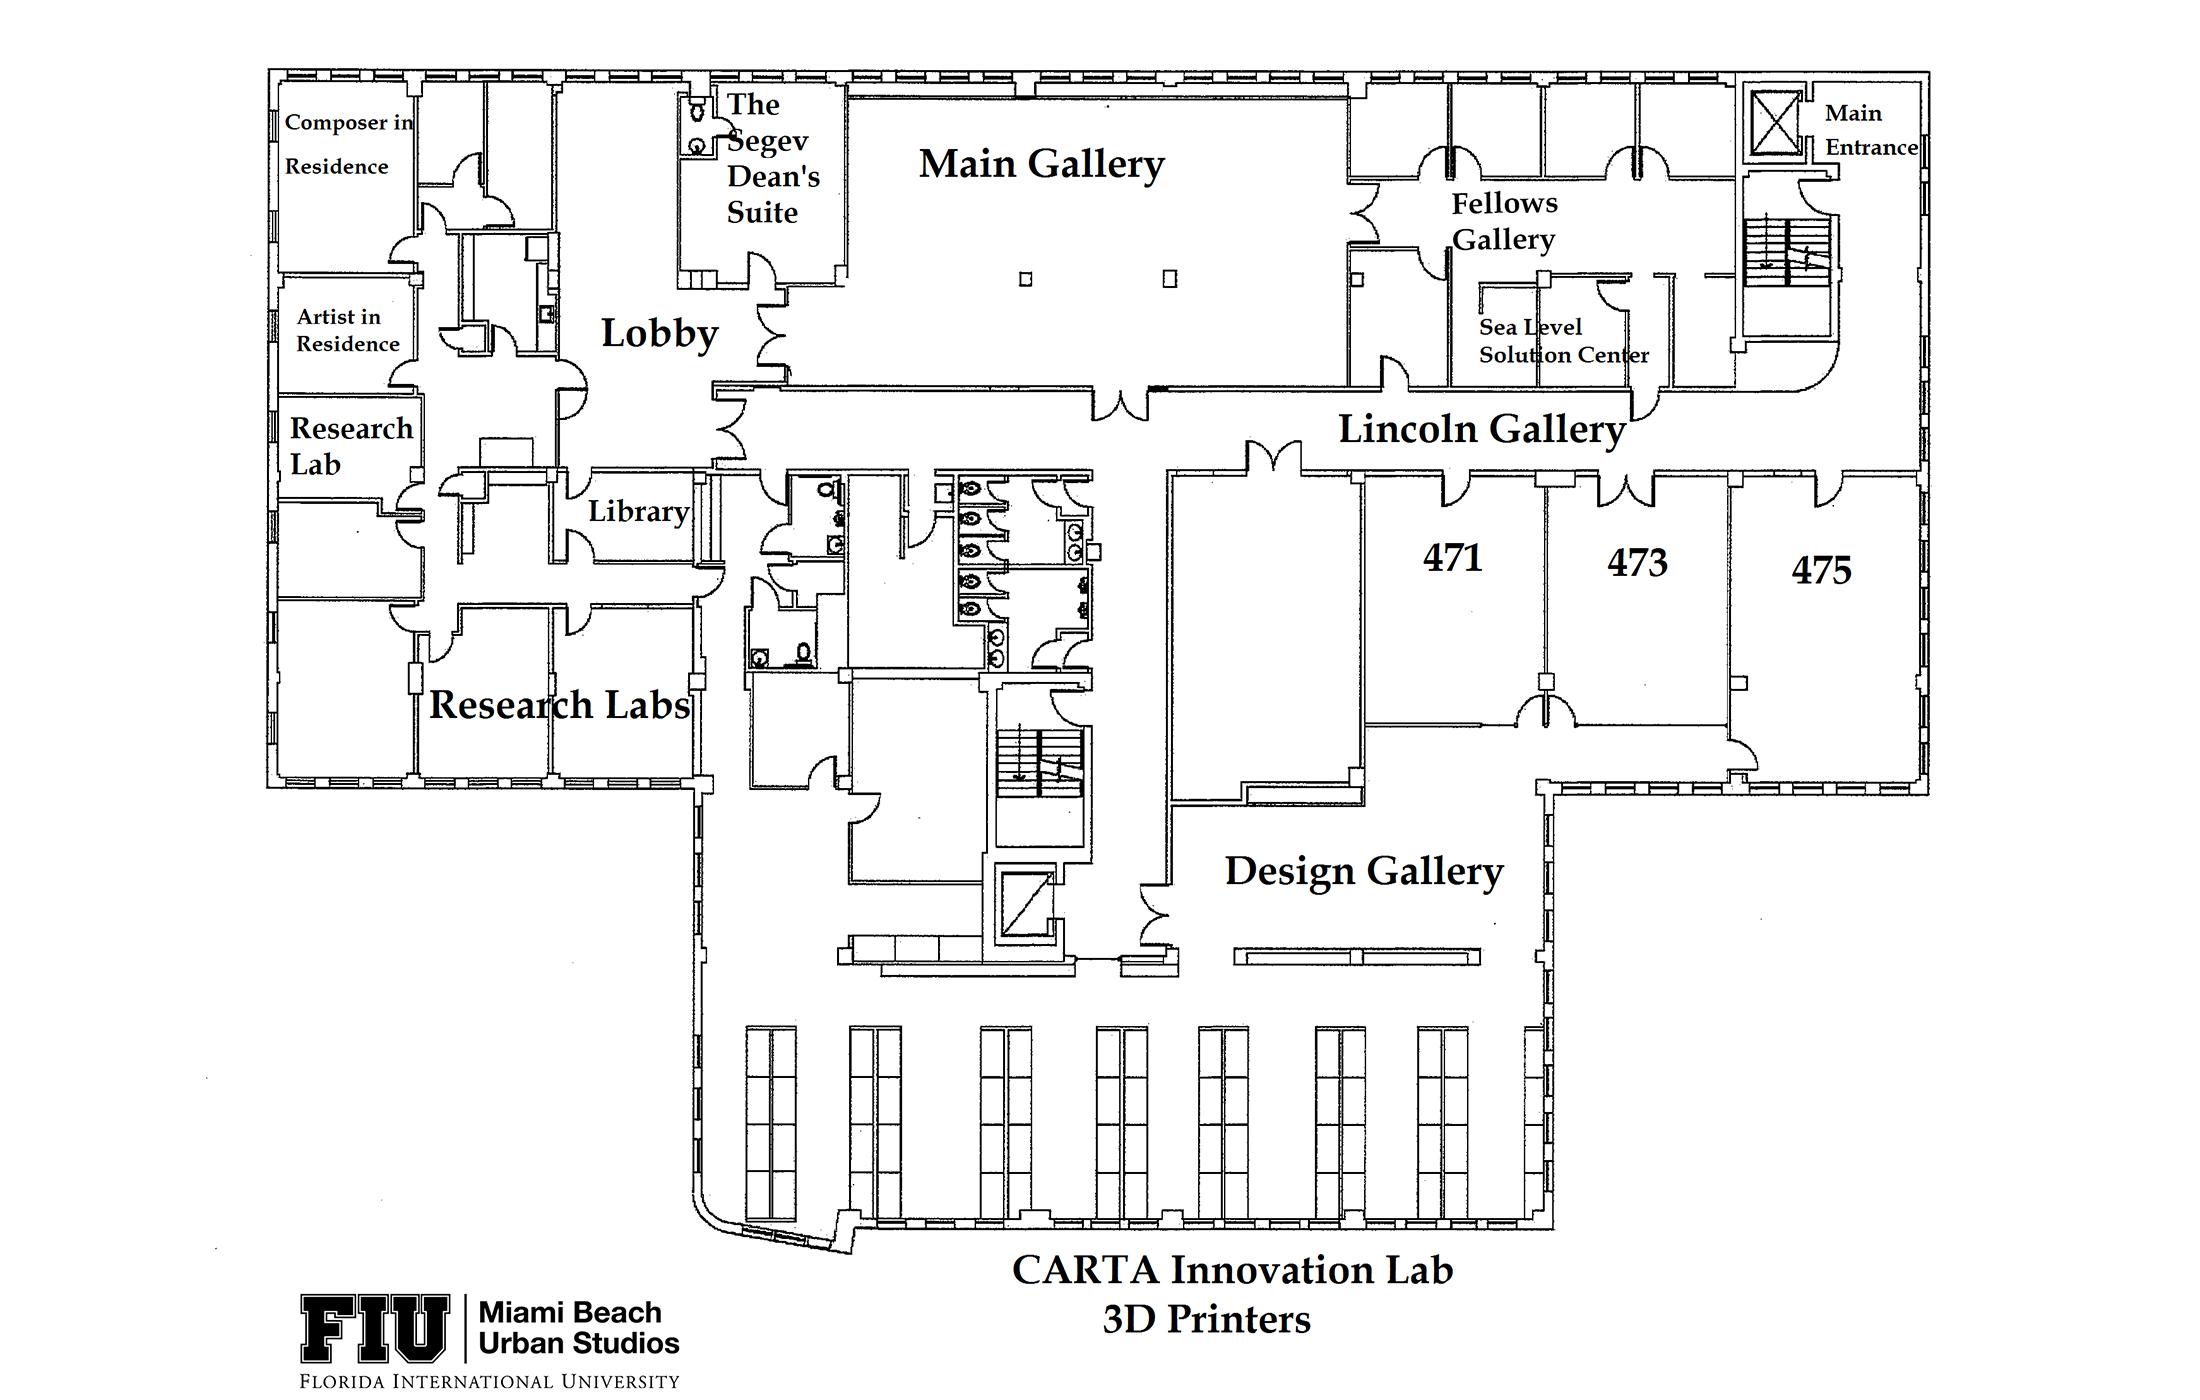 Lincoln Road BID Floor plan with Galleries